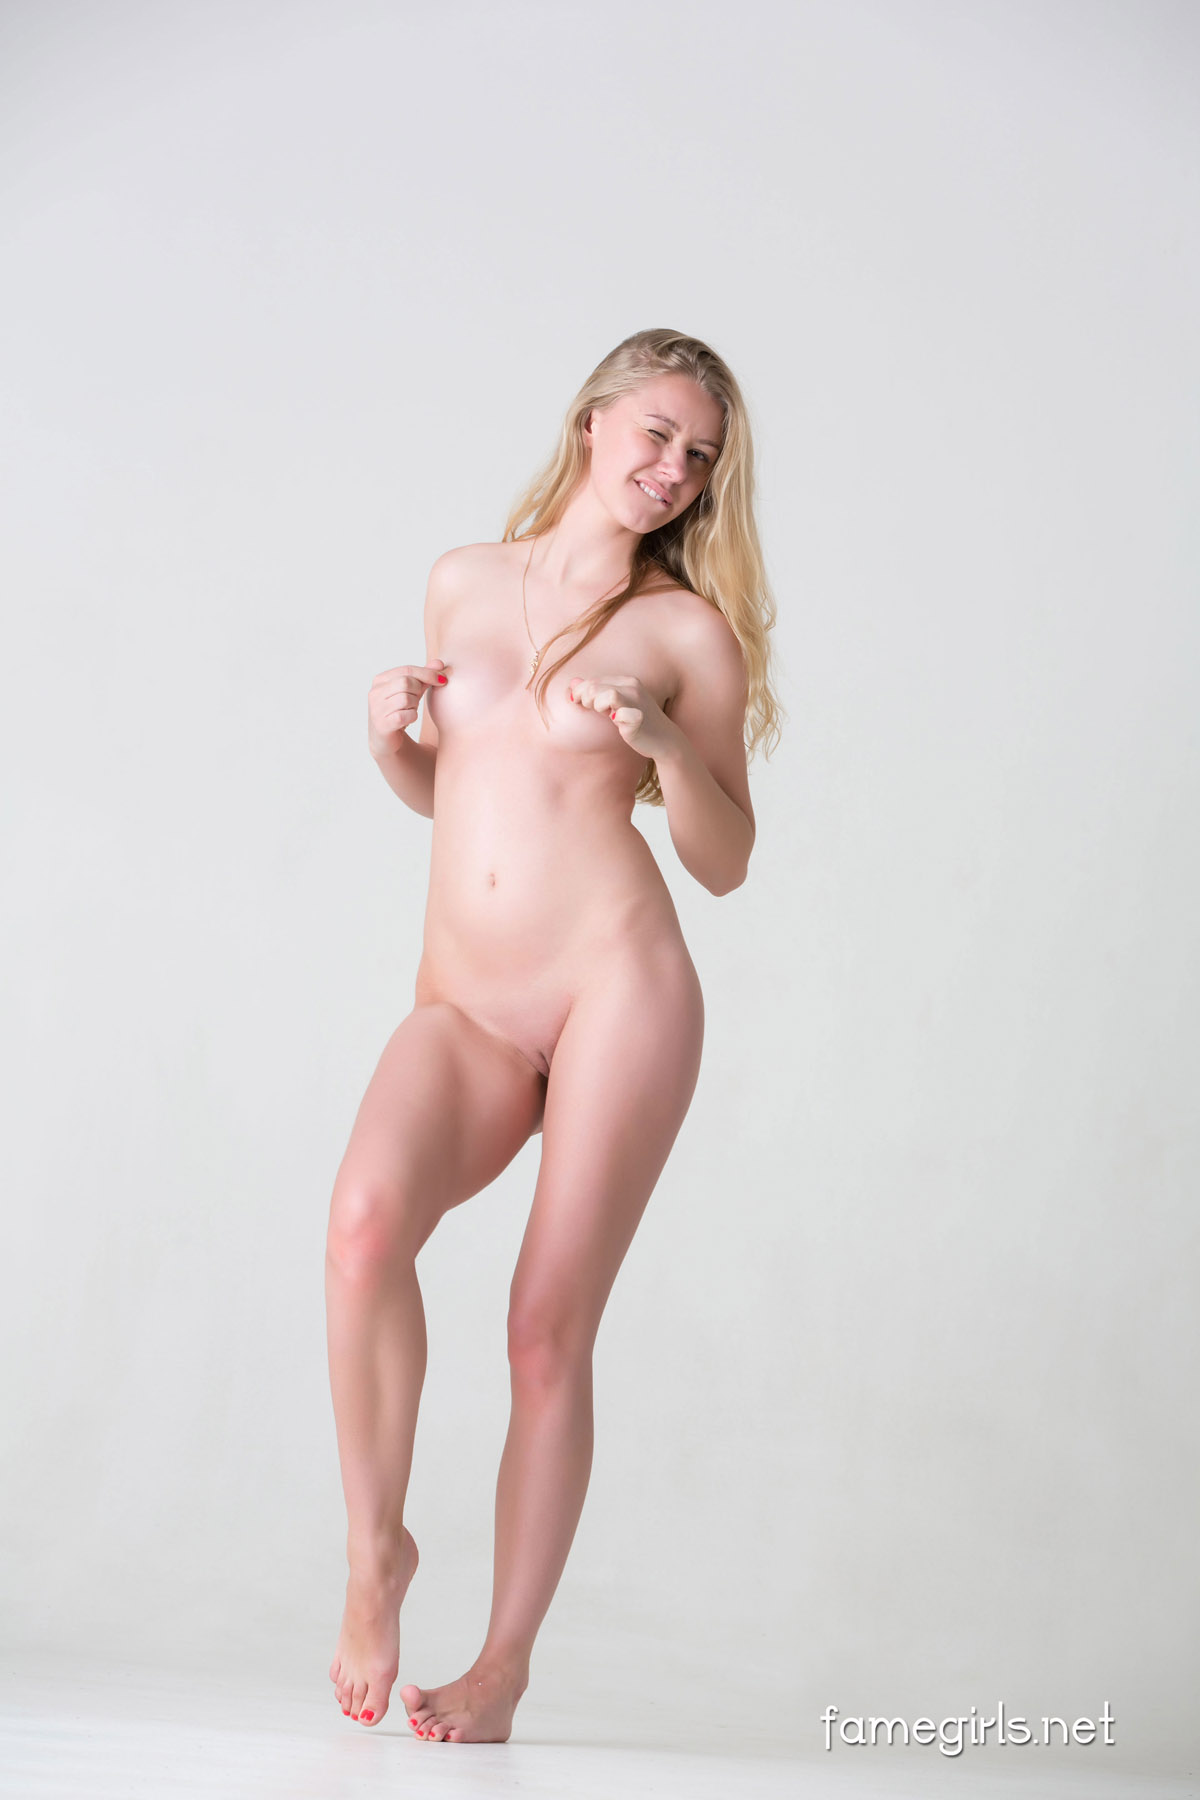 Fame girls sandra porn happens